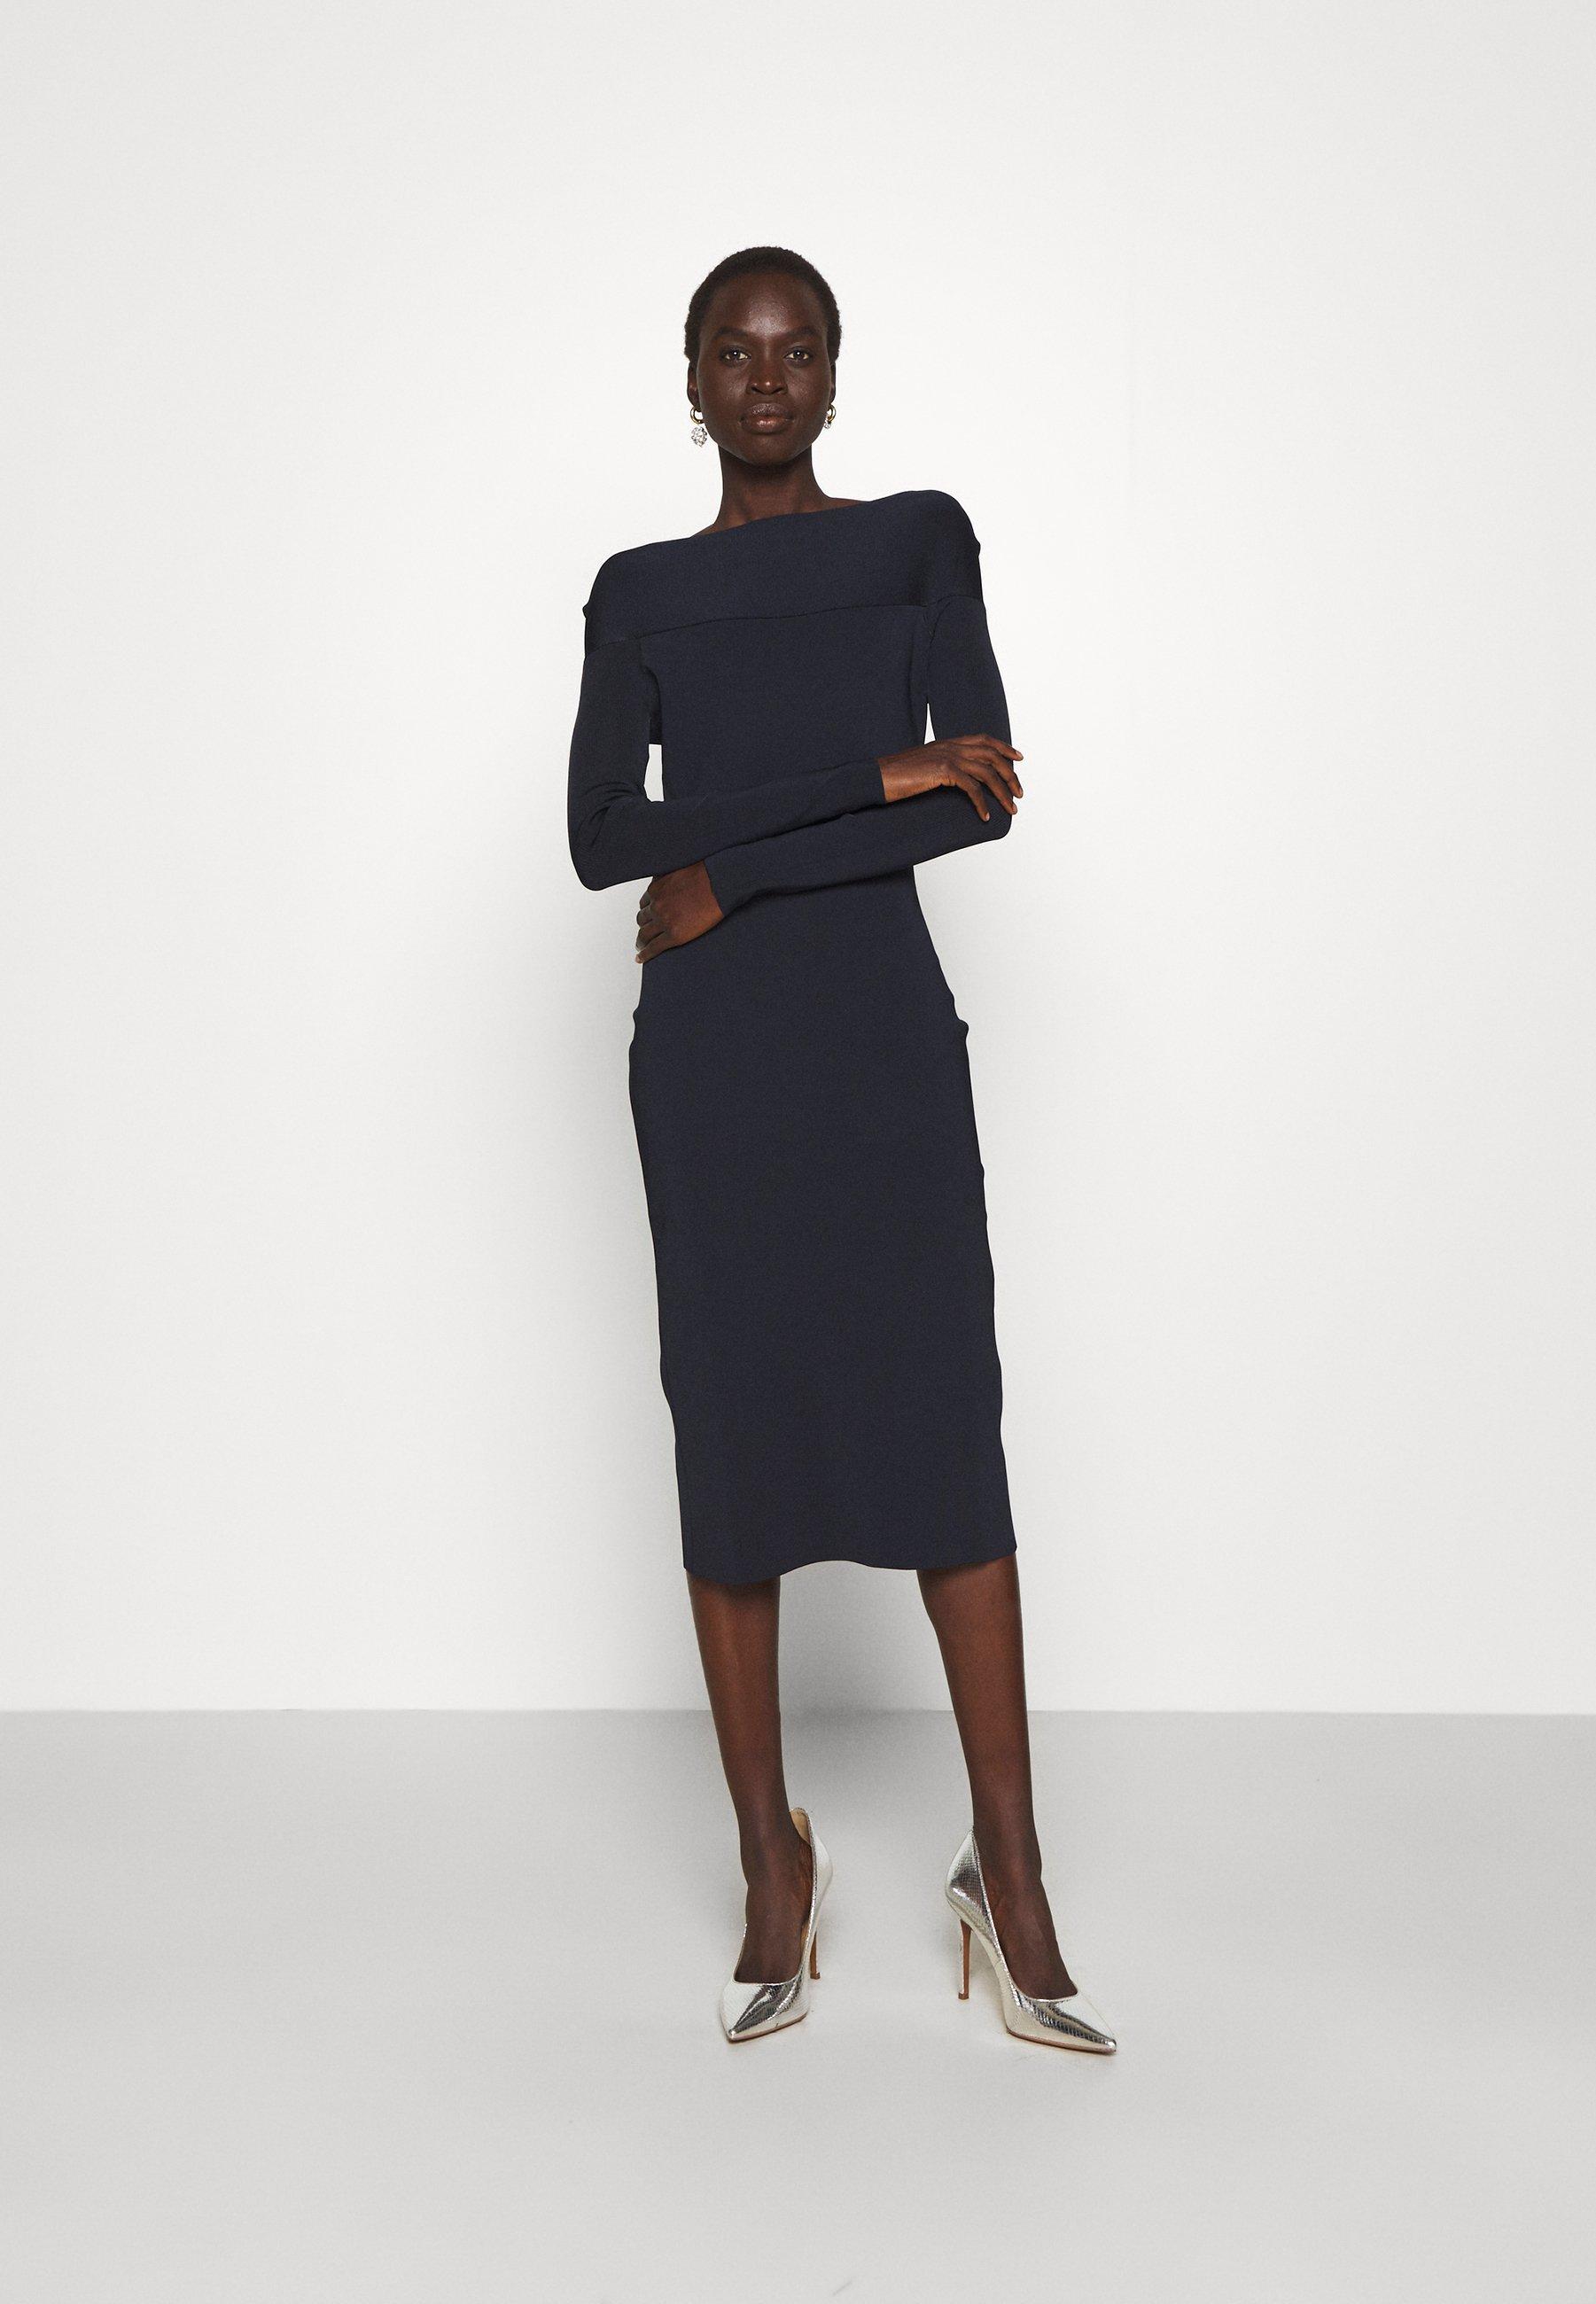 Damen SCOOPED BACK LONG SLEEVE DRESS - Strickkleid